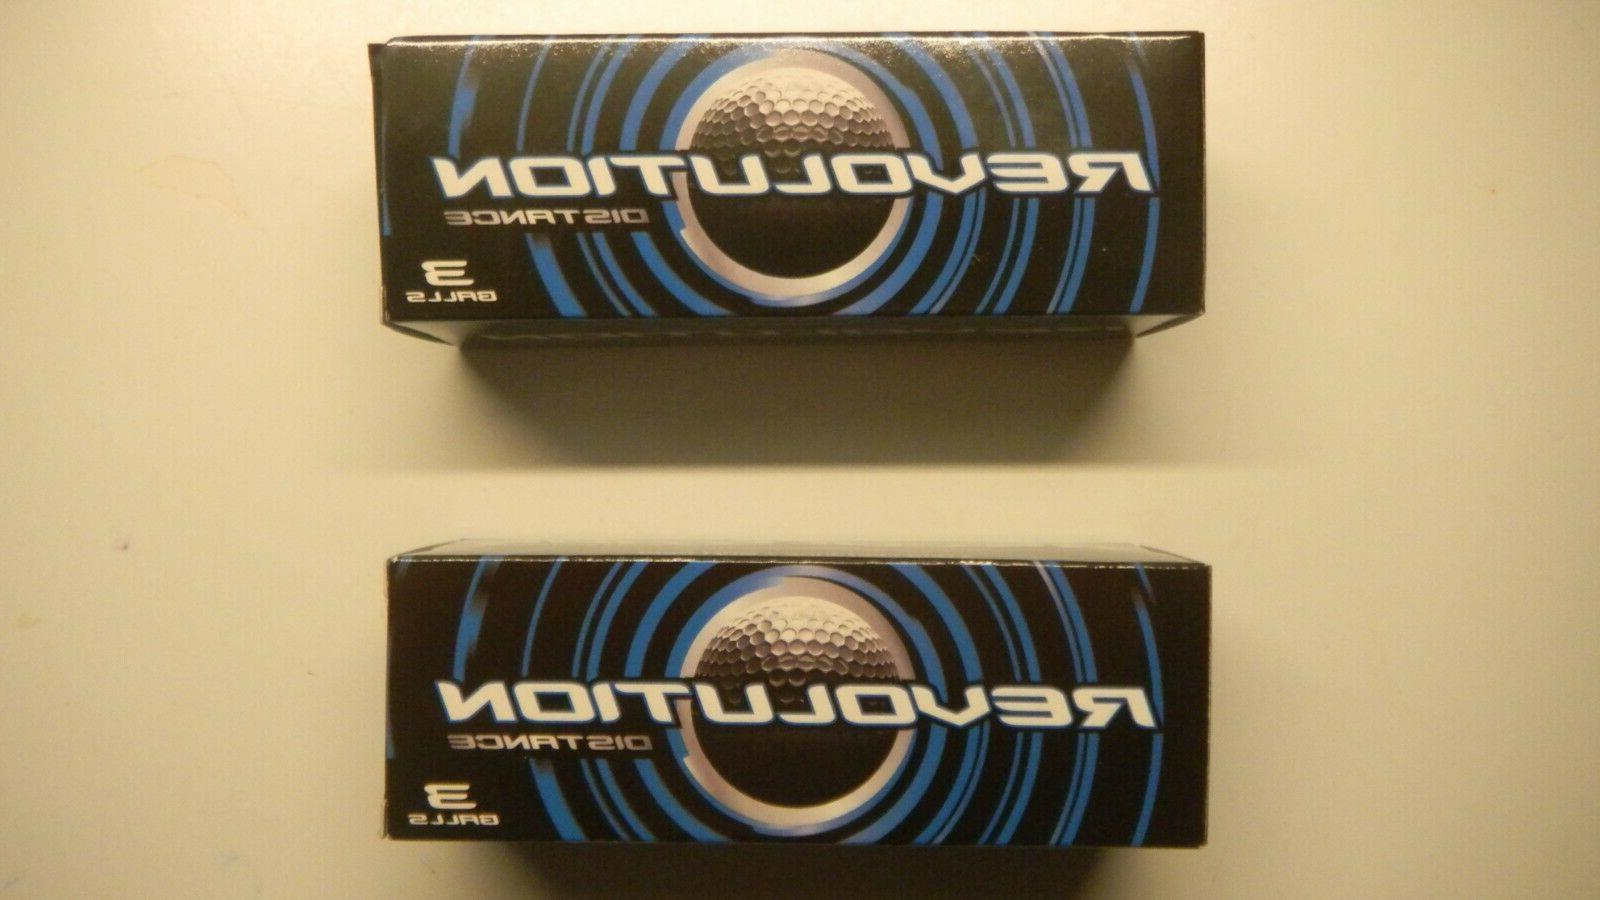 revolution distance golf balls 2 sleeves 6